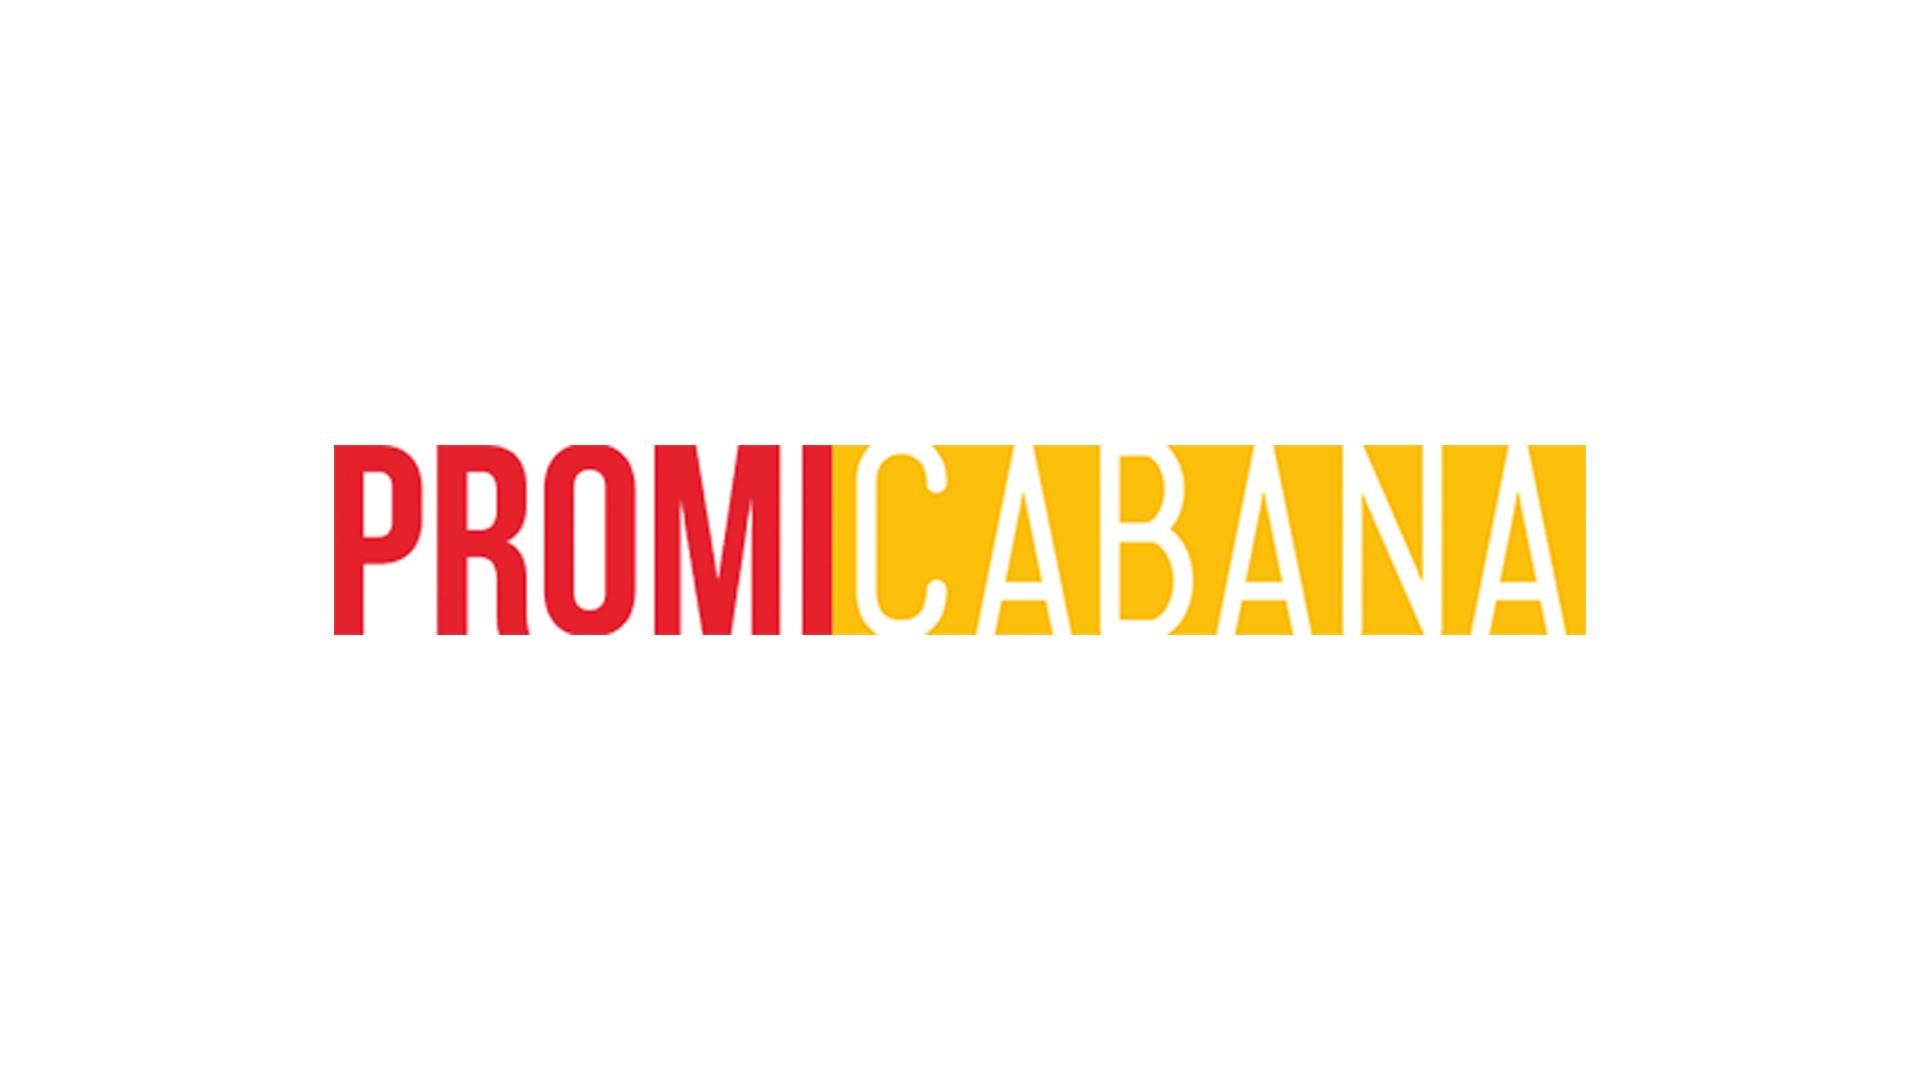 I-Know-What-You-Did-Last-Summer-Sarah-Michelle-Gellar-Ryan-Phillippe-Jennifer-Love-Hewitt